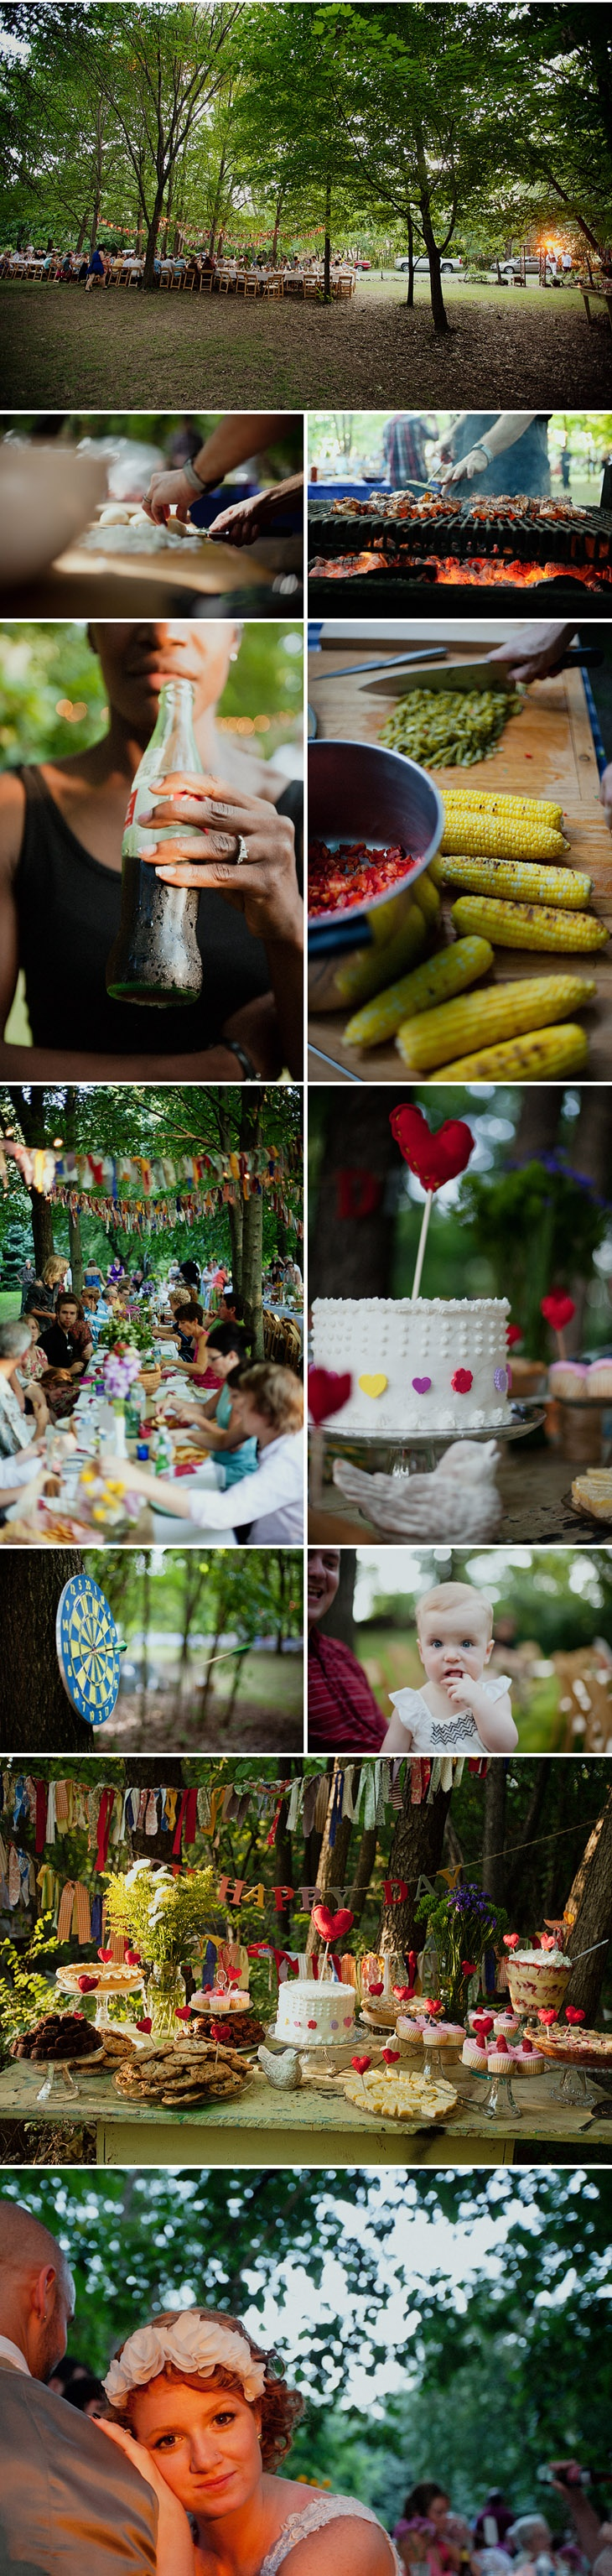 177 best wedding love images on pinterest marriage wedding